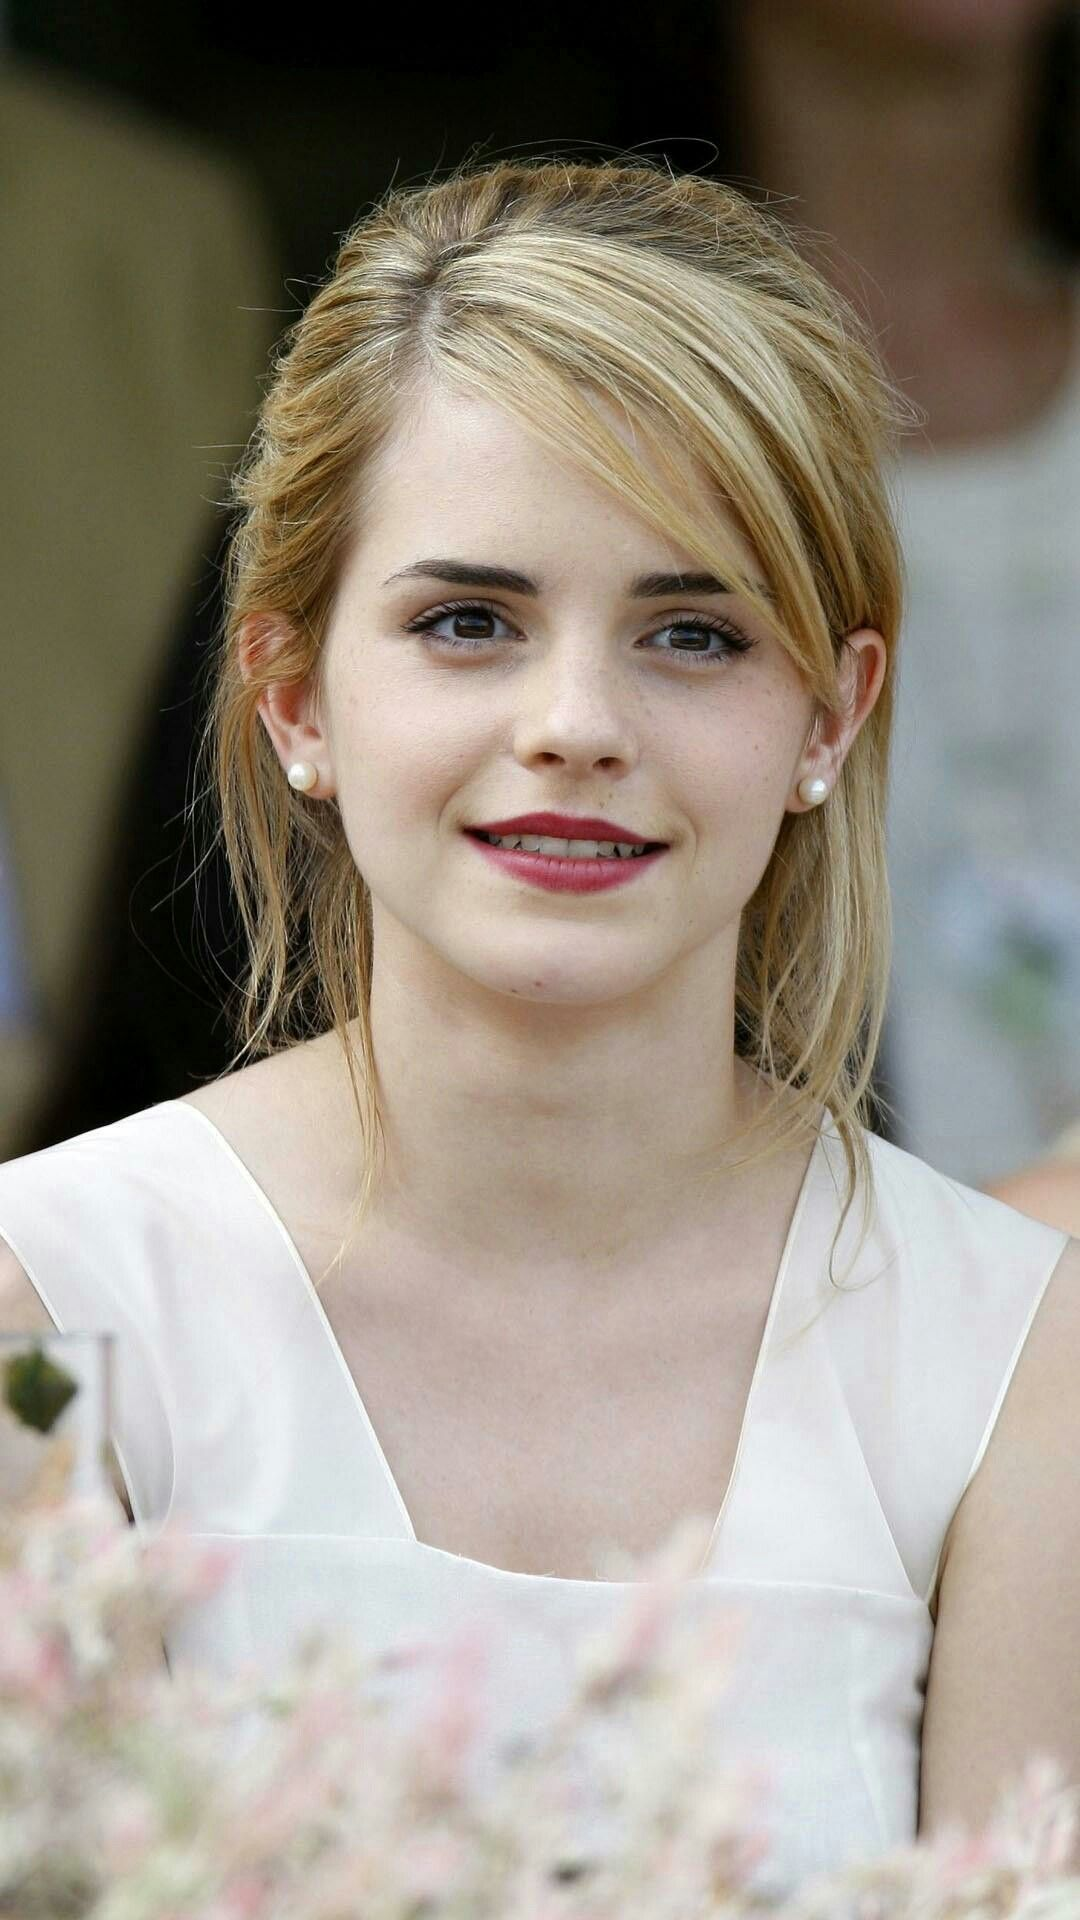 Pin By Prashant Kumar Sp On Onlyhd By Prashant Emma Watson Images, Photos, Reviews